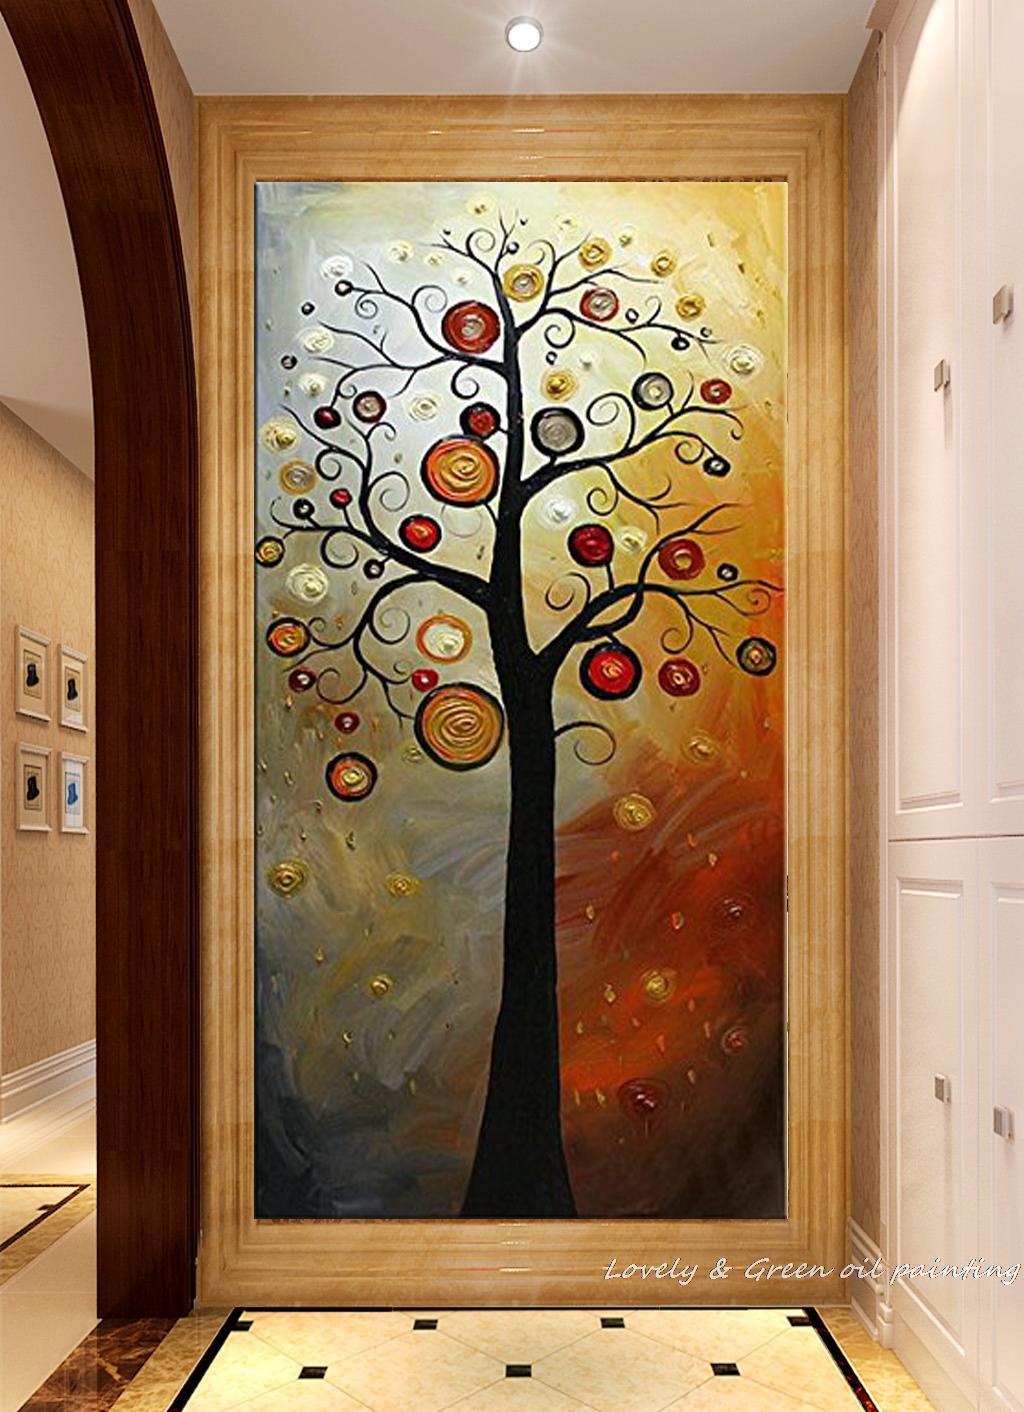 Wall Art Sets For Living Room online get cheap money wall art -aliexpress | alibaba group